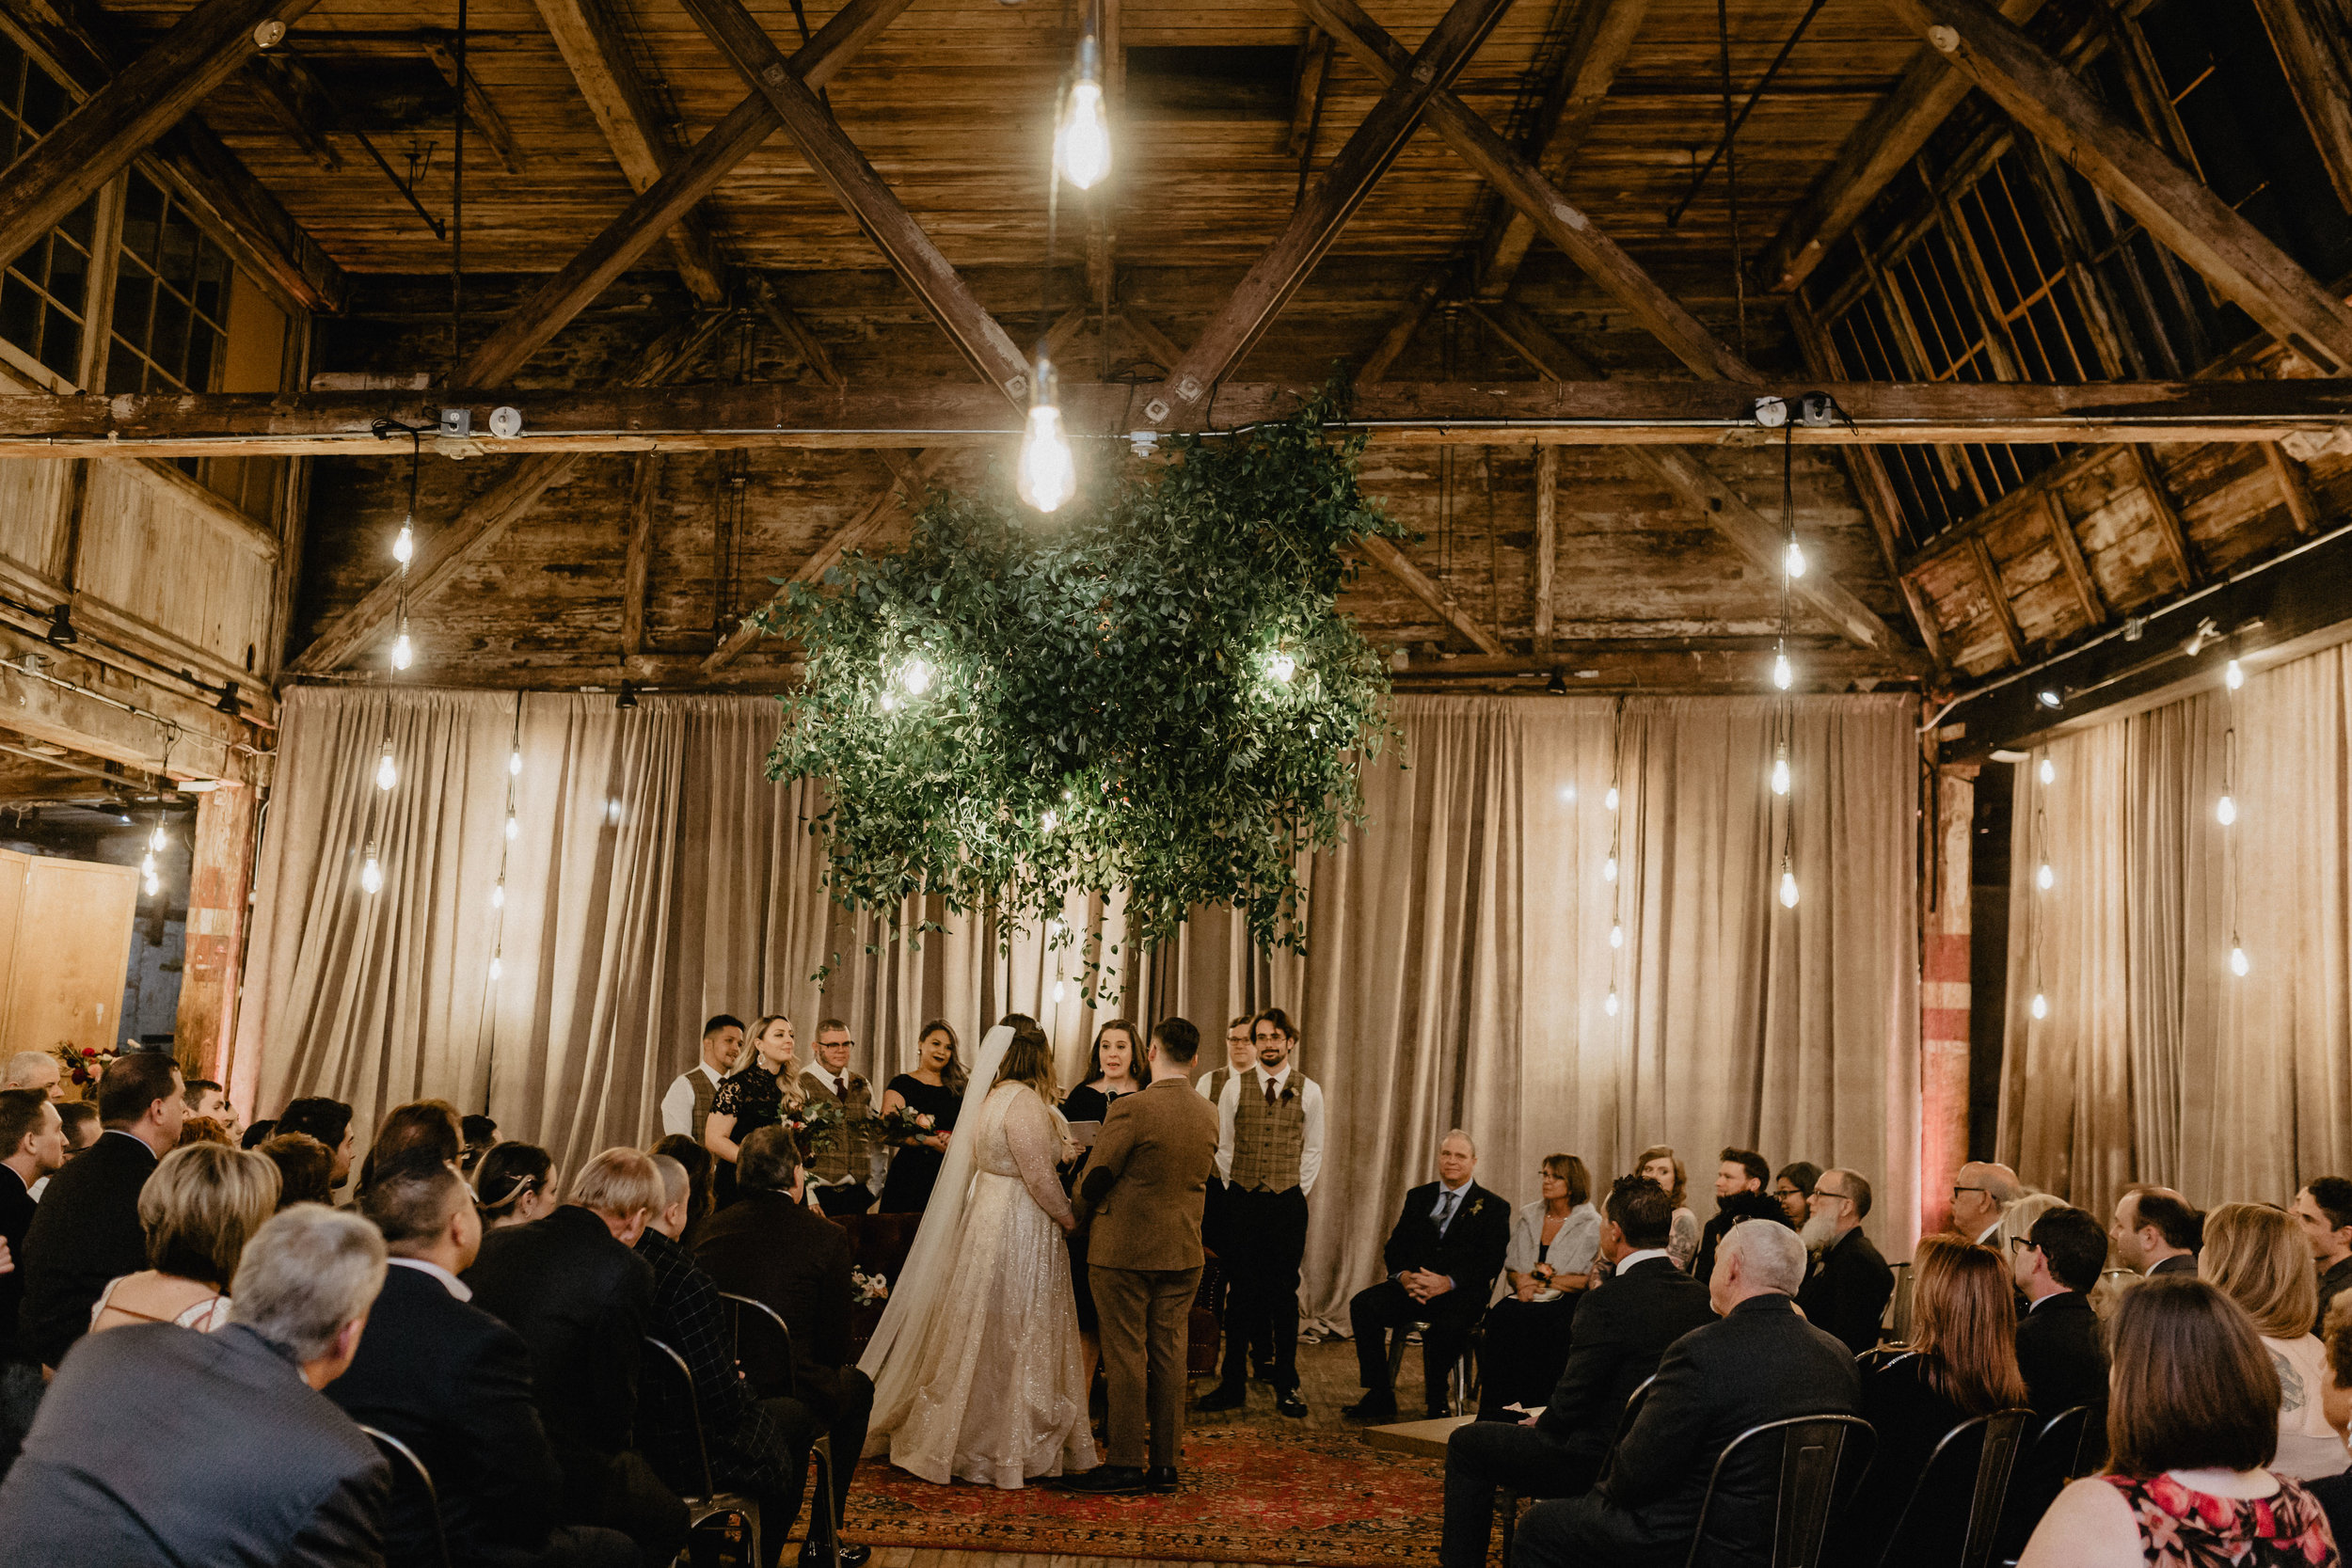 greenpoint_loft_wedding_096.jpg